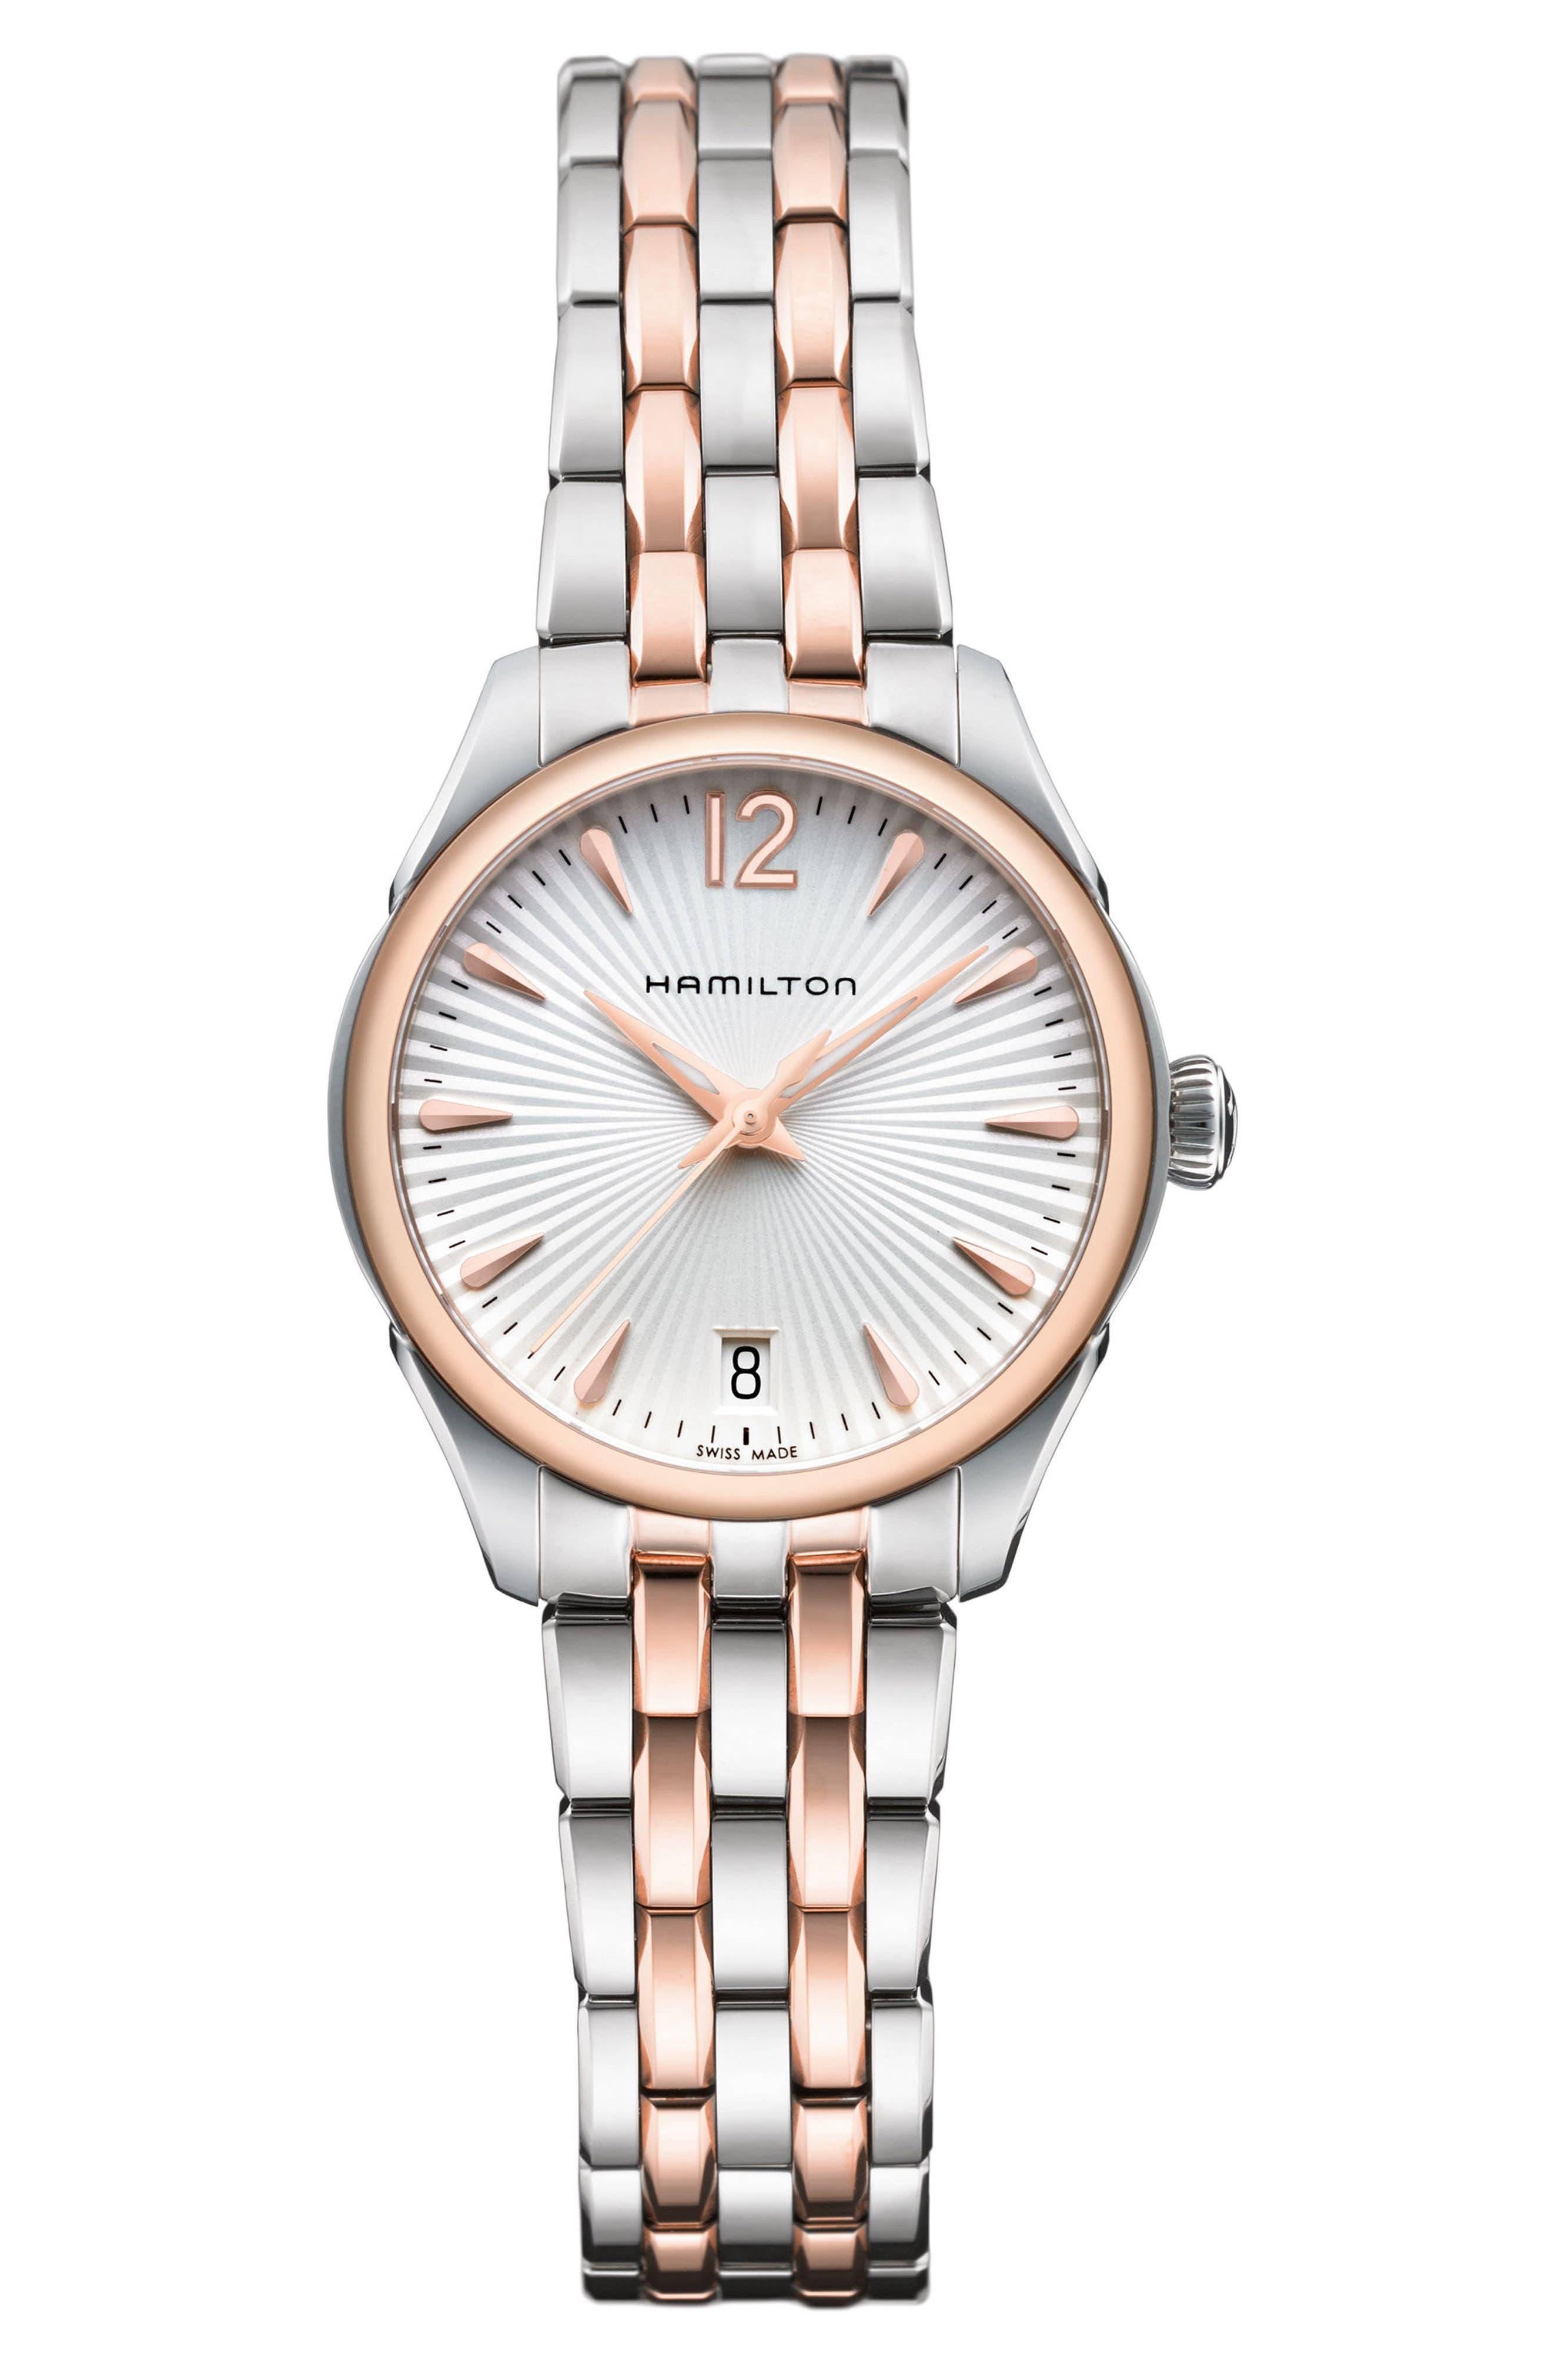 HAMILTON Jazzmaster Lady Bracelet Watch, 30mm, Main, color, SILVER/ ROSE GOLD